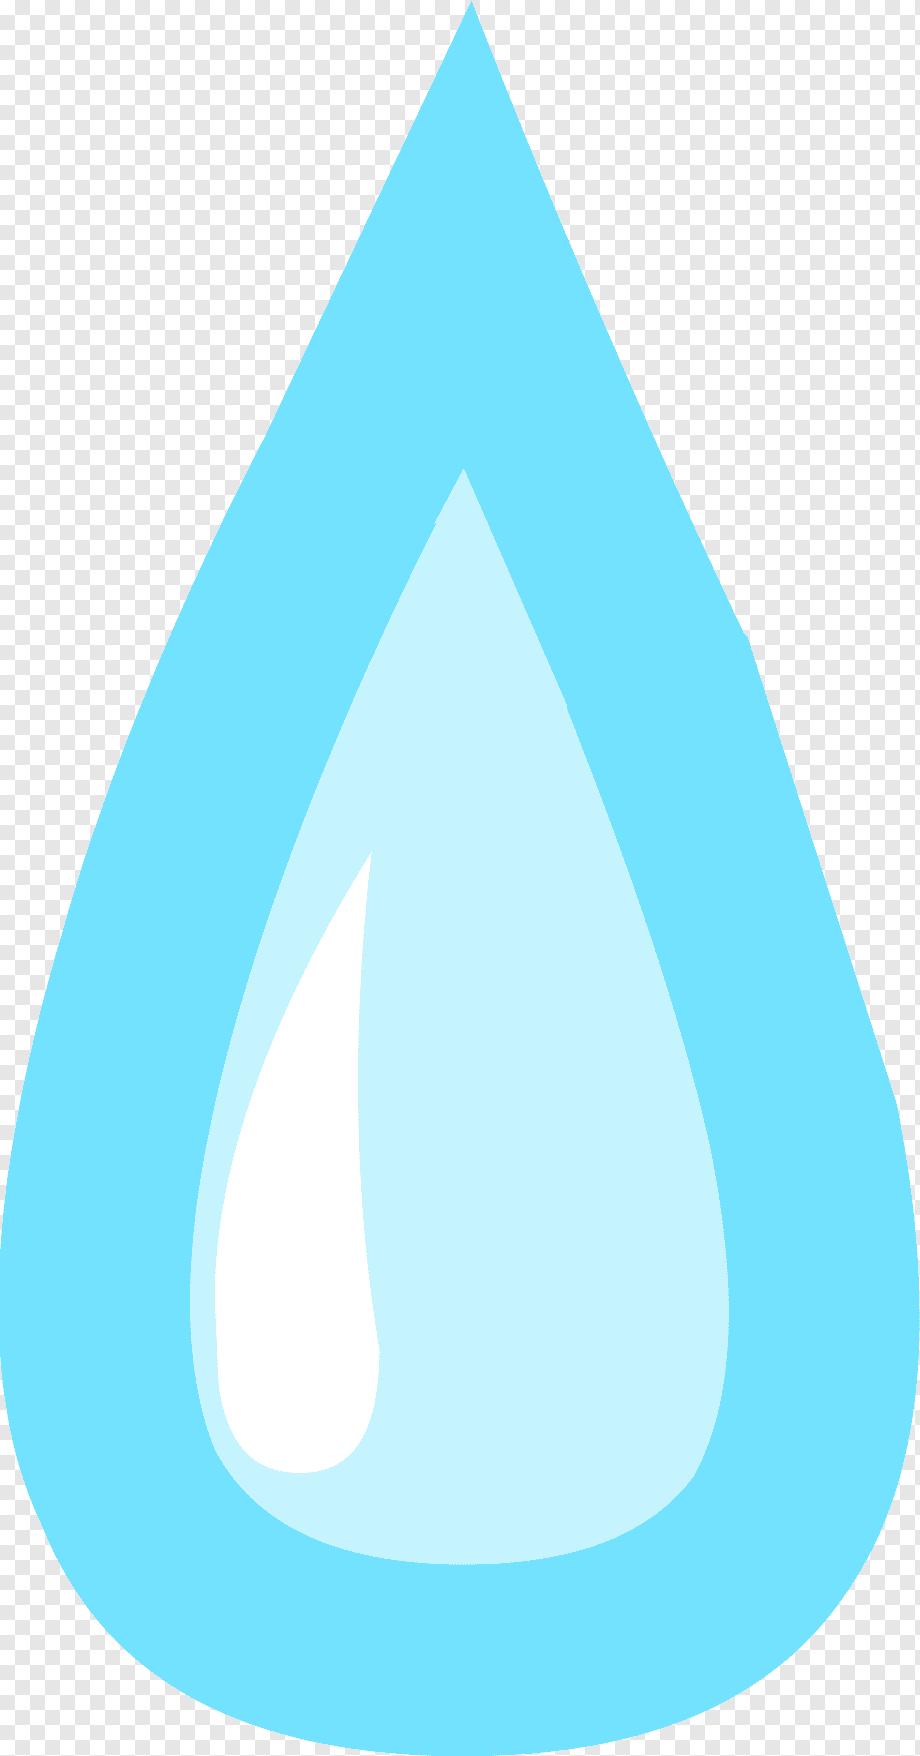 Air Mata Png : Triangle, Turquoise, Circle,, Mata,, Biru,, Sudut,, Segitiga, PNGWing